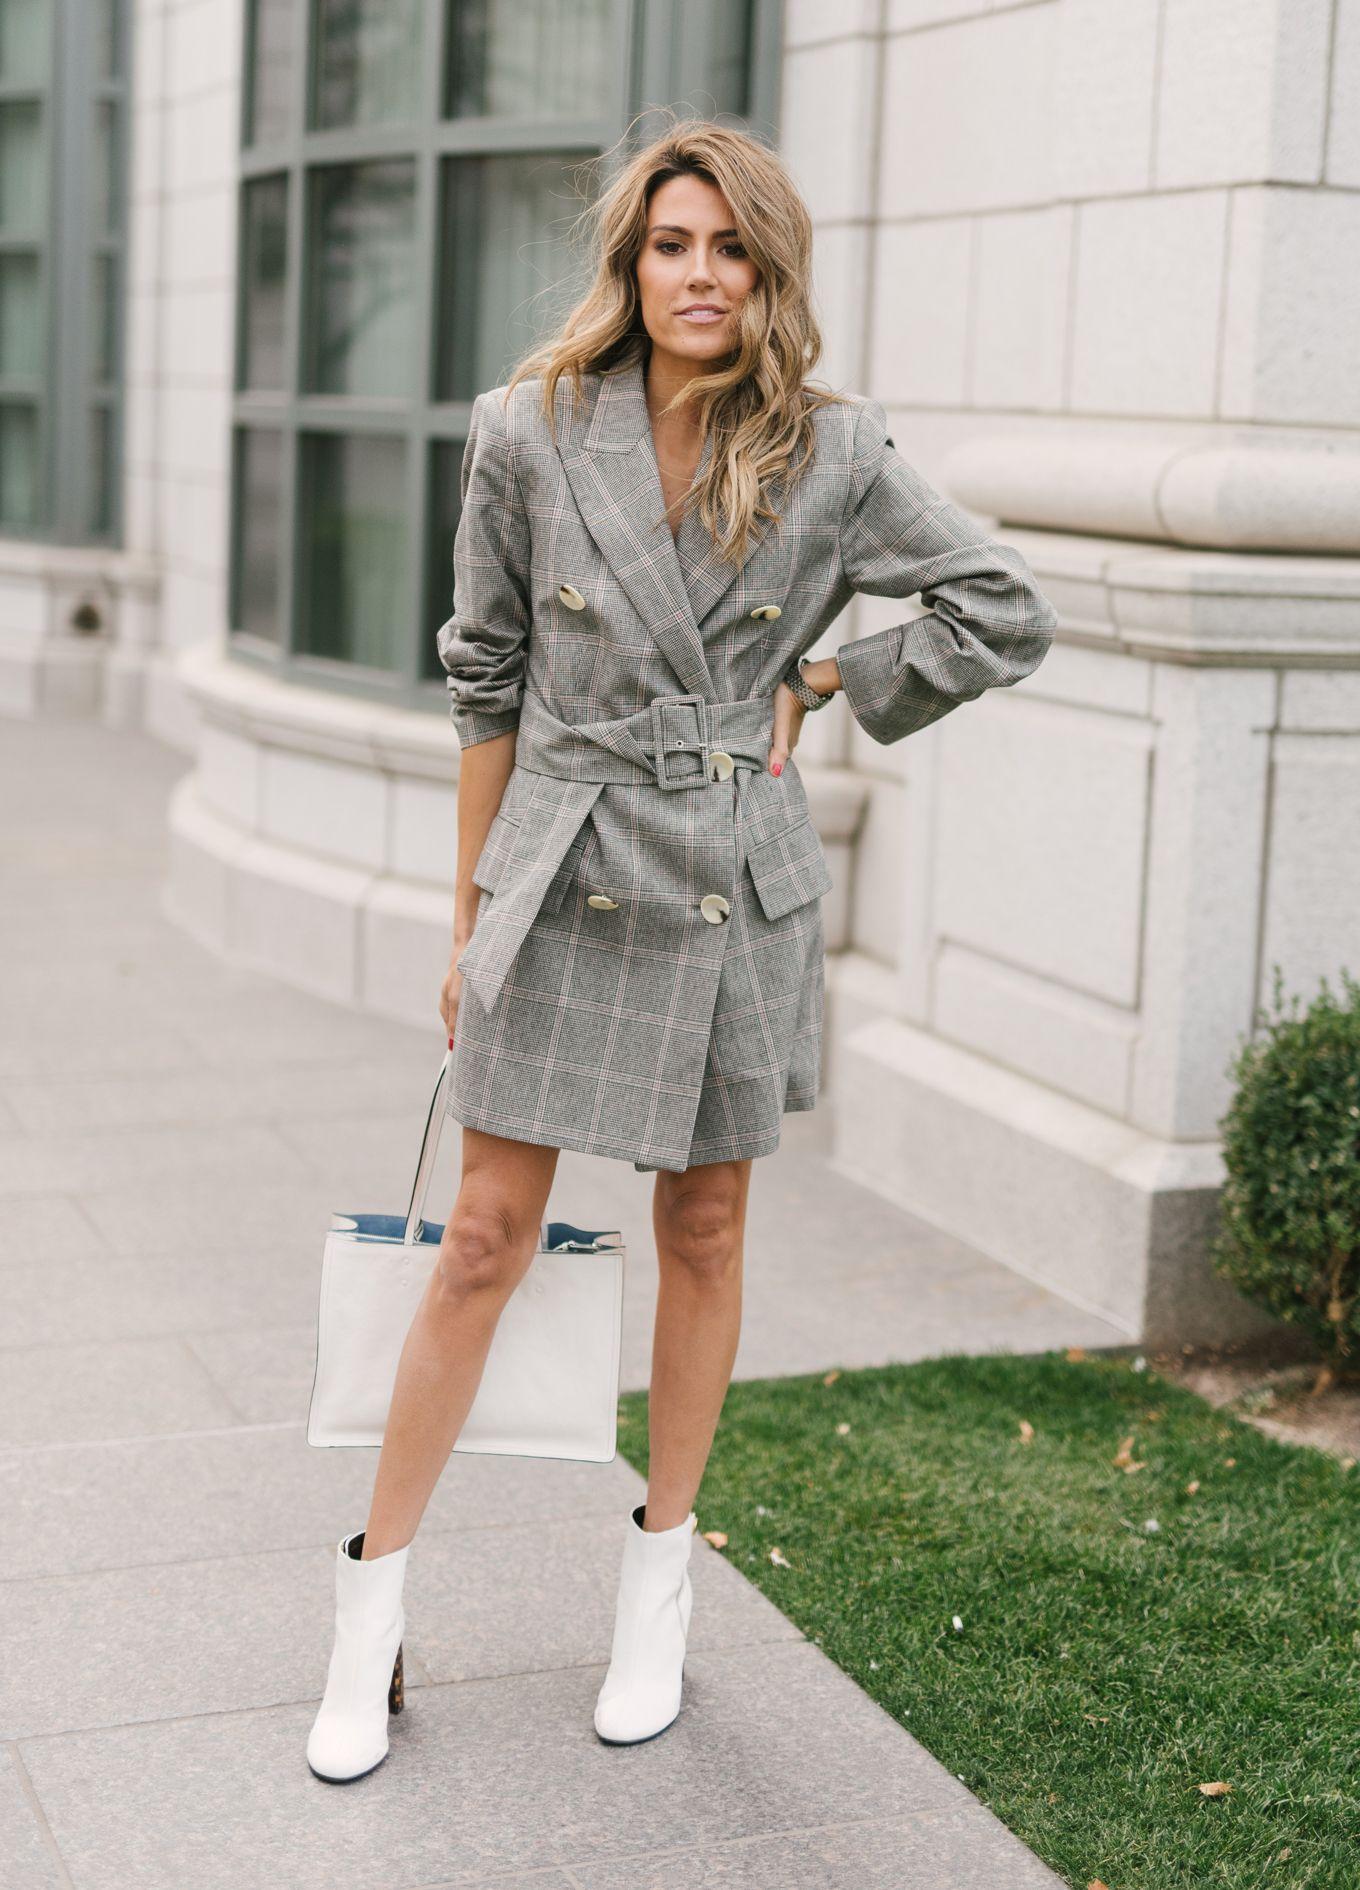 961f887db4 Grey checked wrap blazer-dress+white heeled ankle boots+white handbag. Fall  Workear/ Dressy Casual Outfit 2017